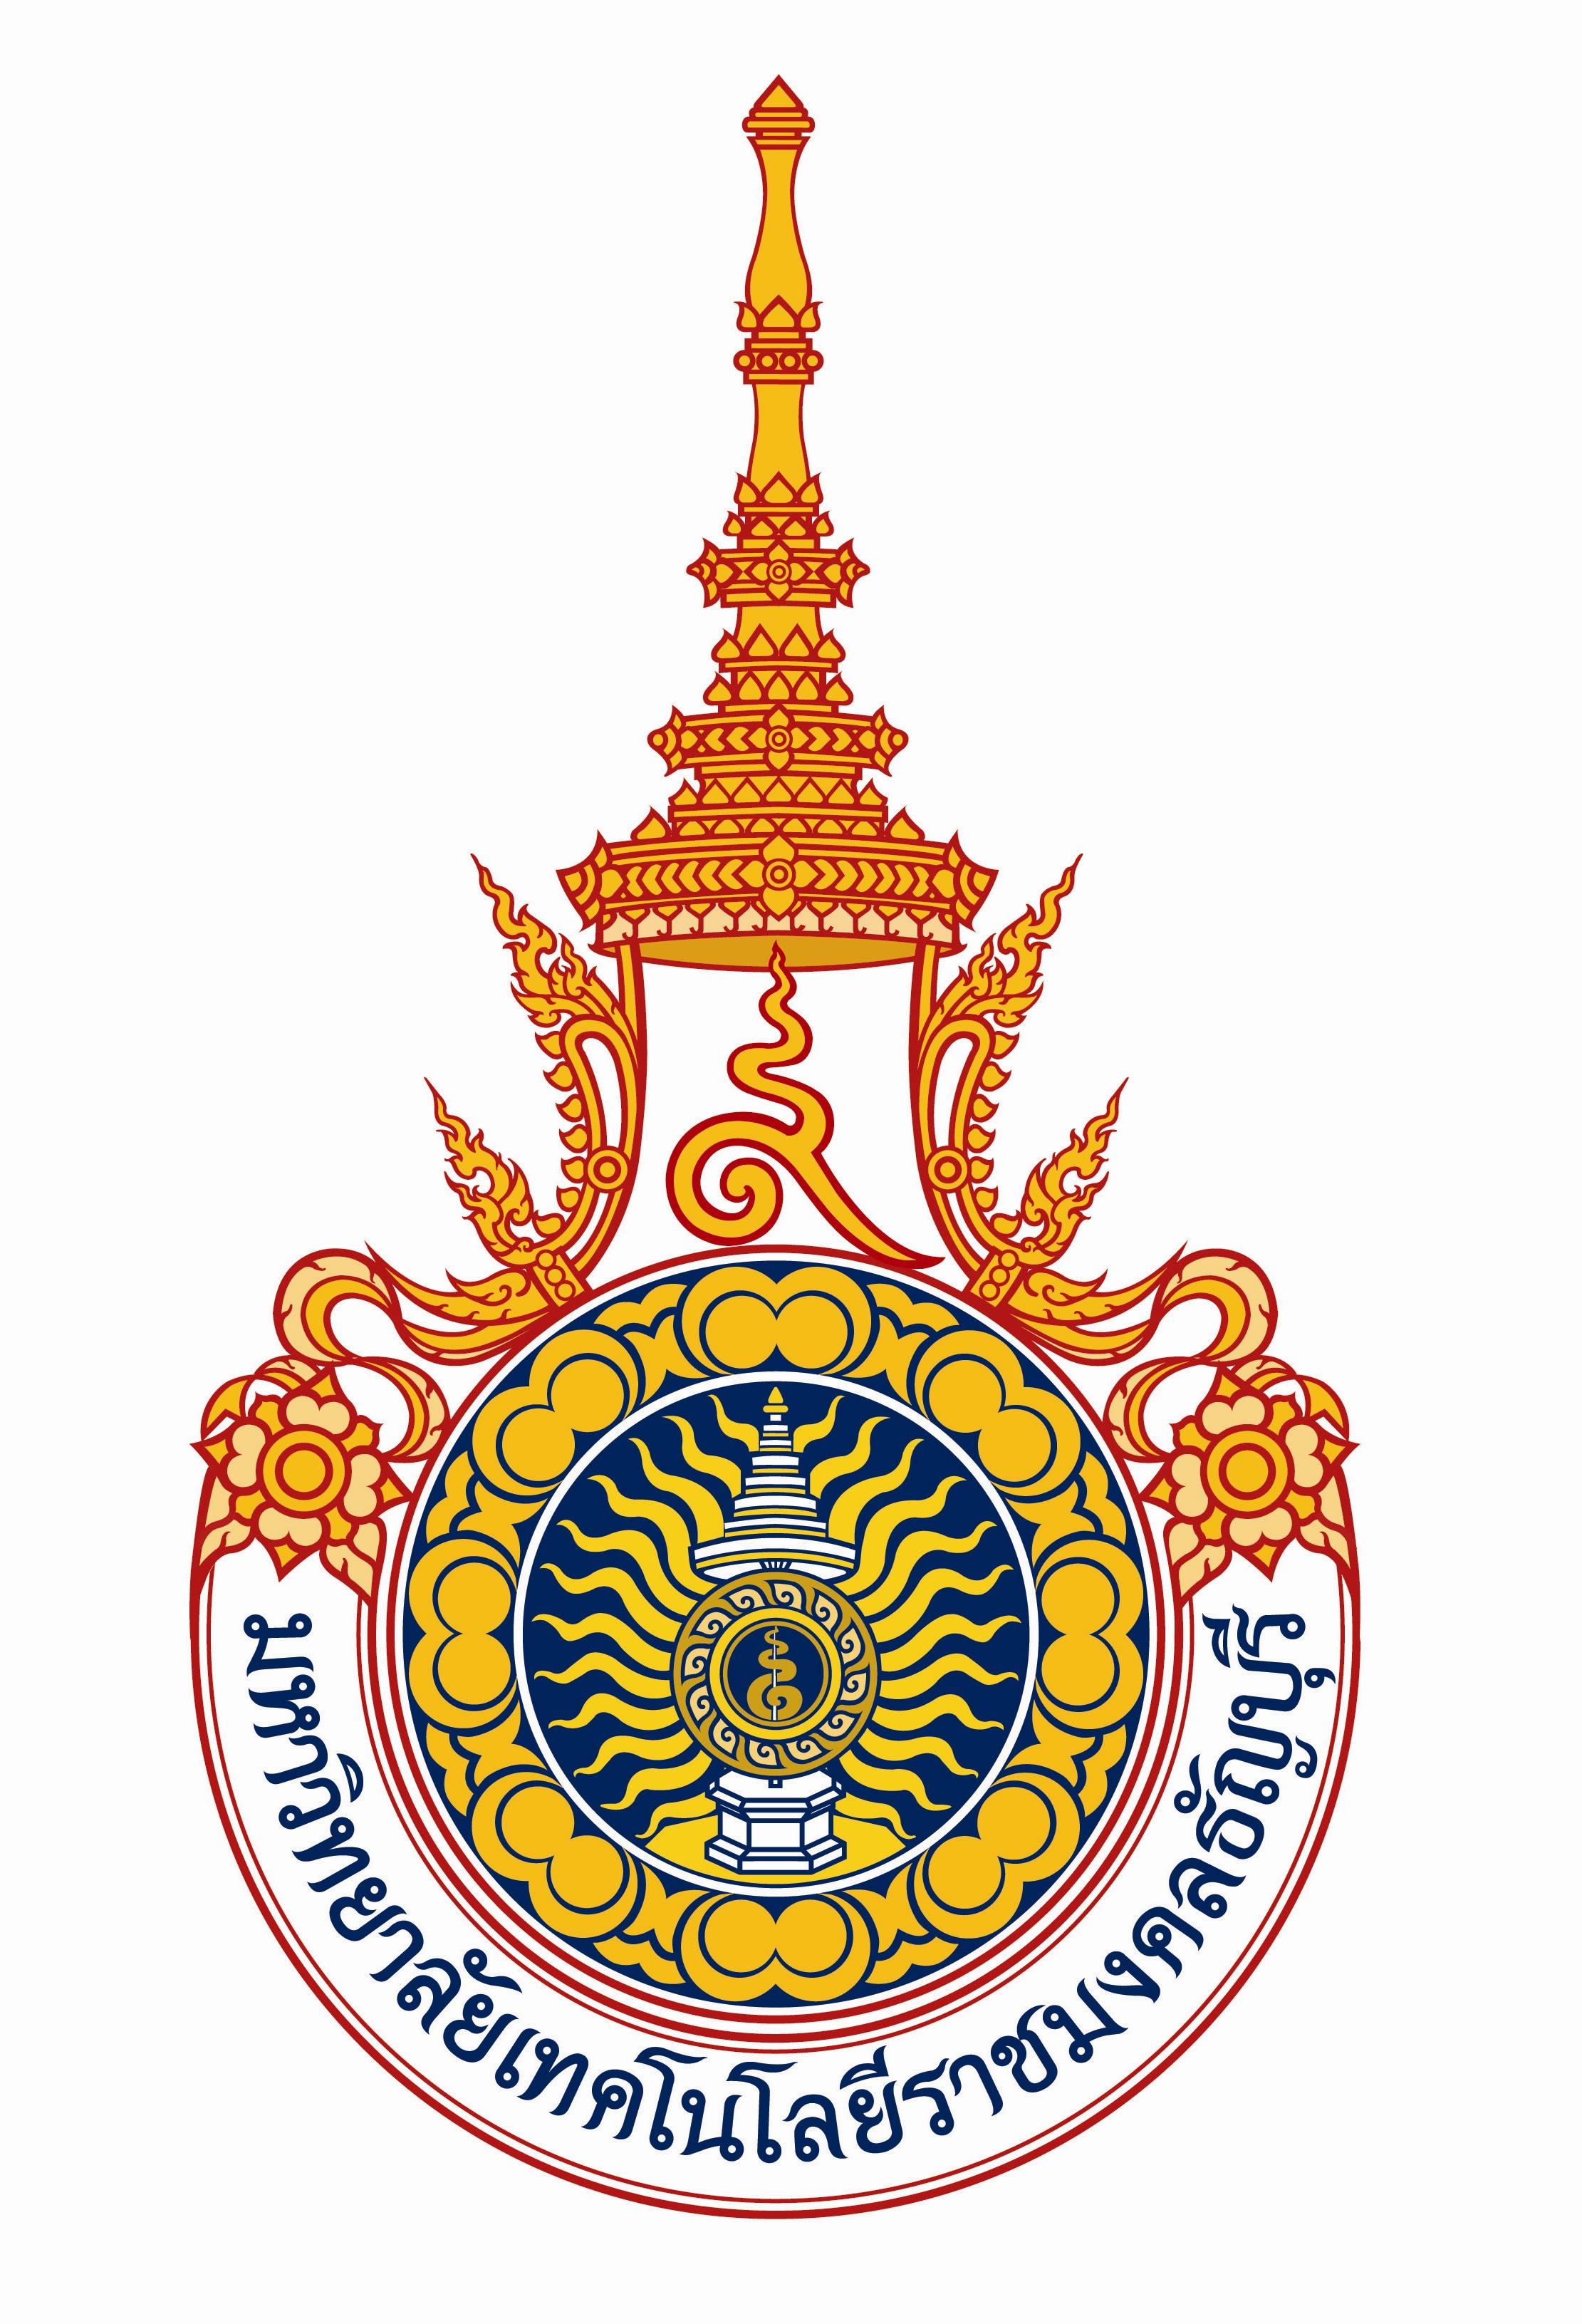 color-logo-thai-rmutt